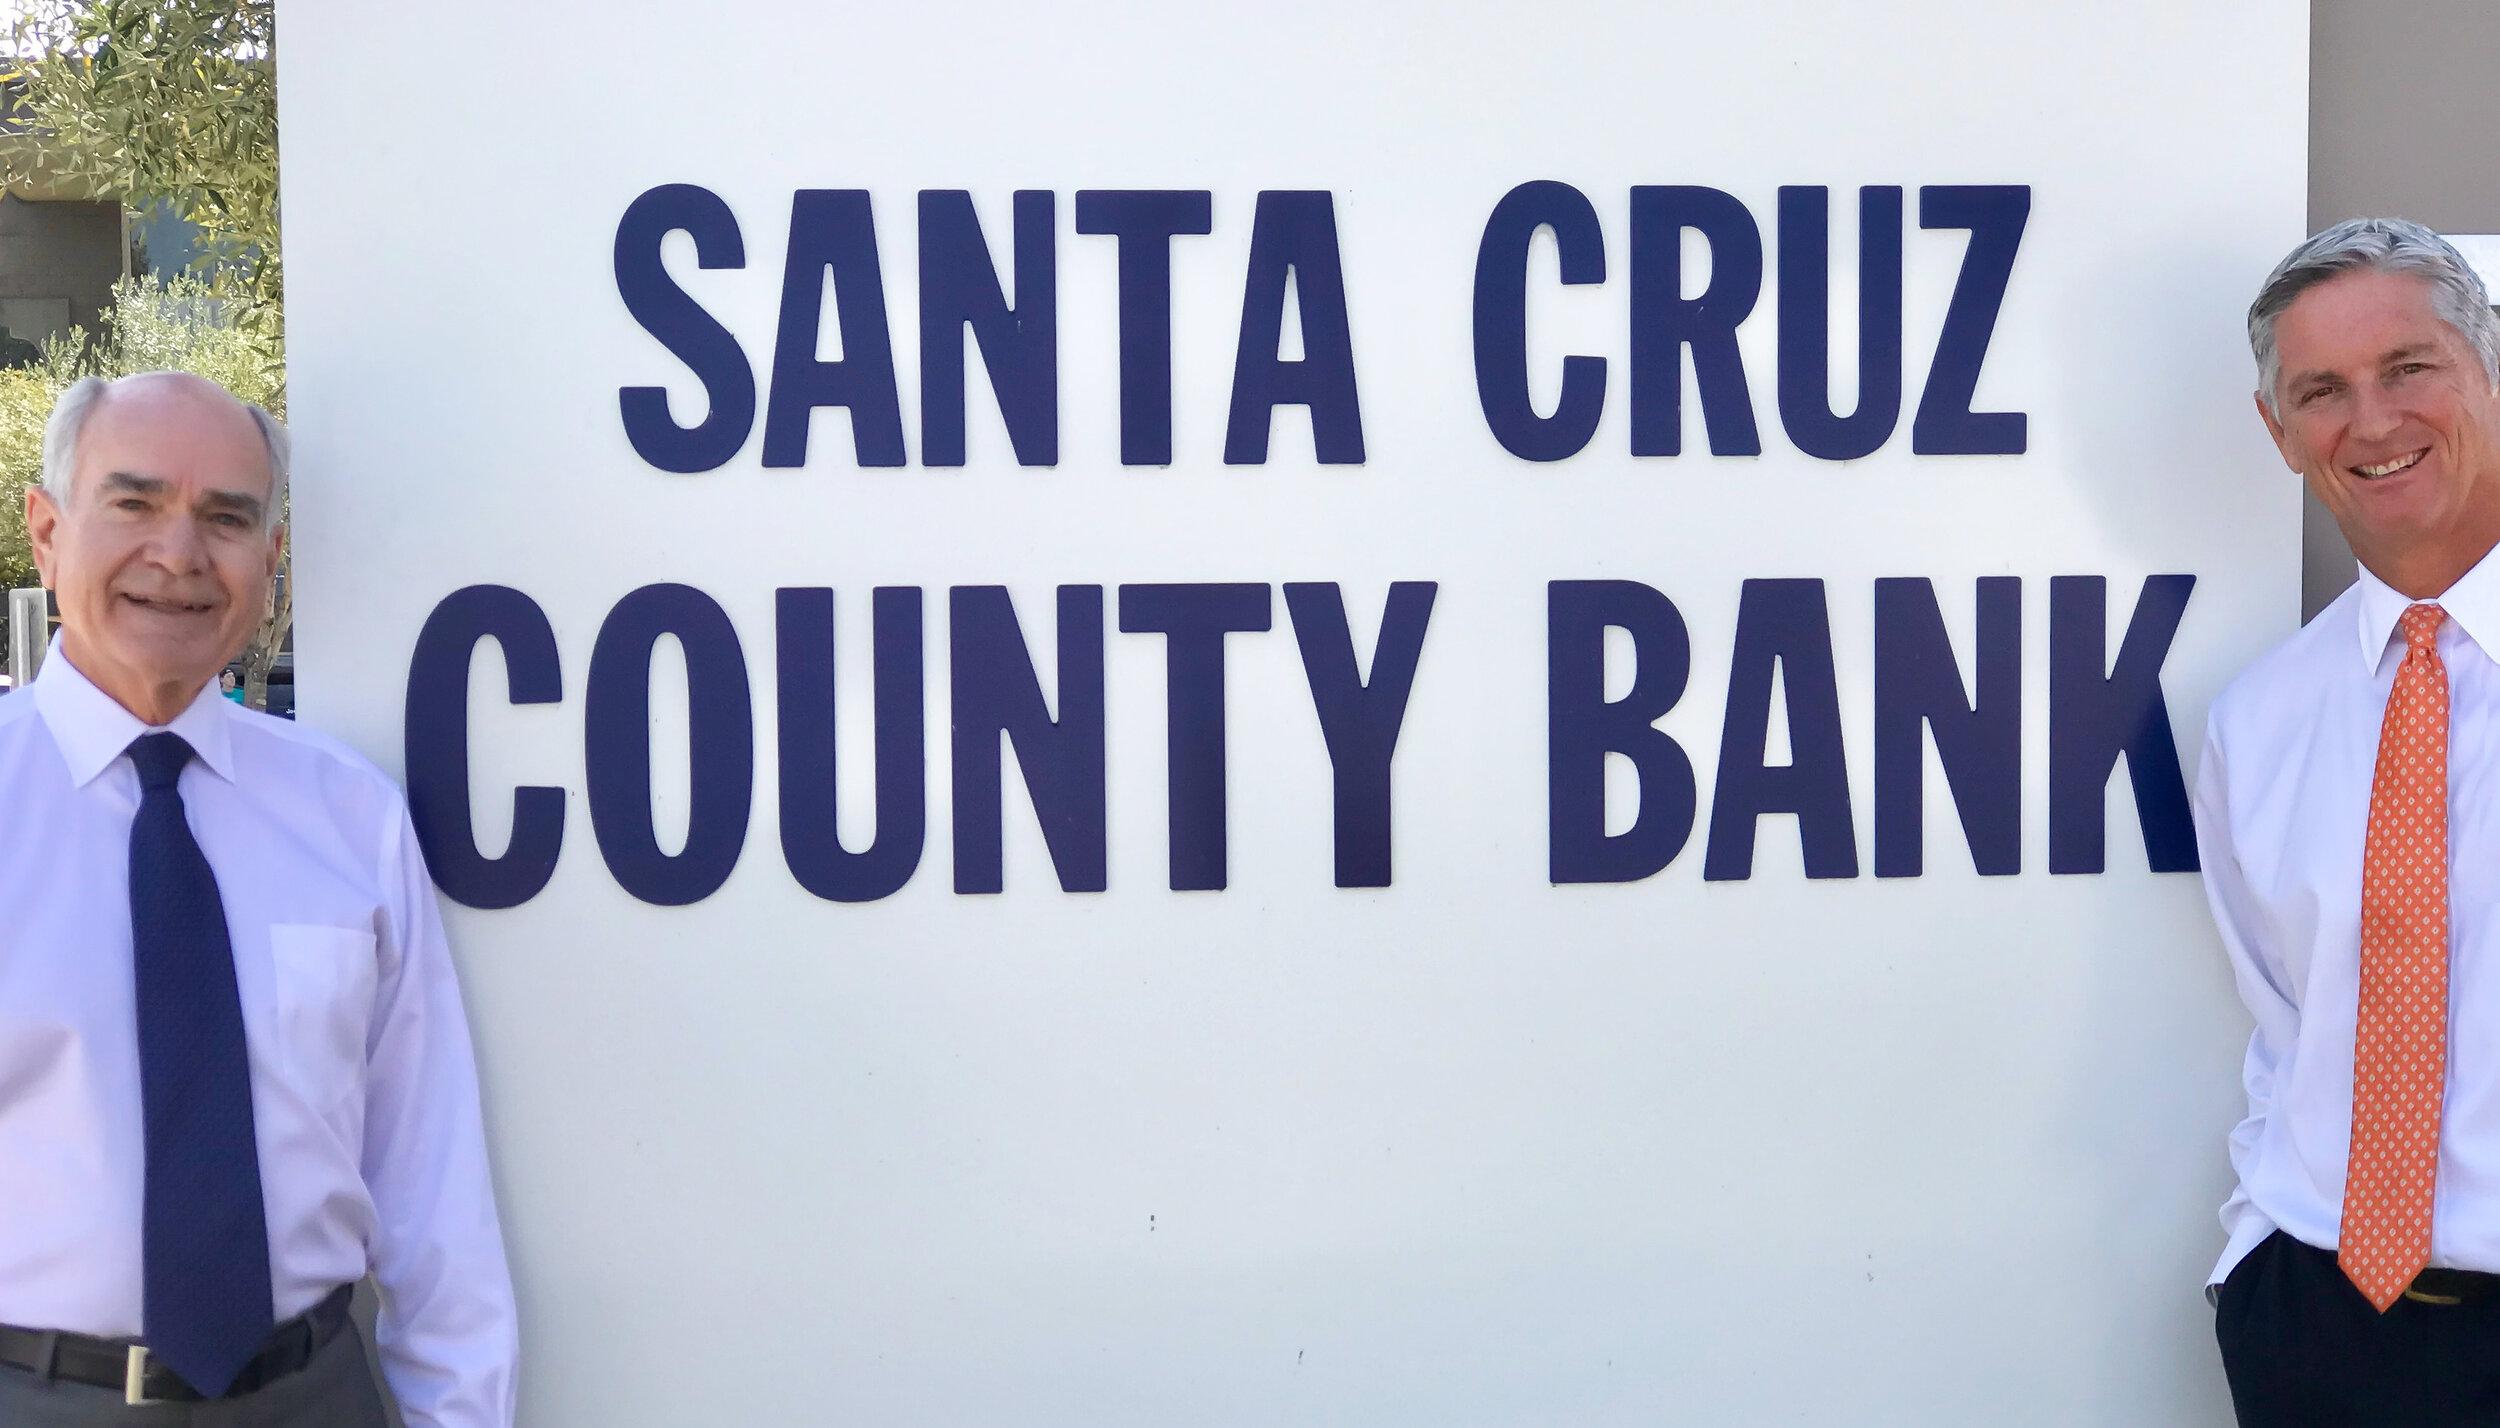 David Heald, president of Santa Cruz County Bank, and Jon Sisk, president of Lighthouse Bank.